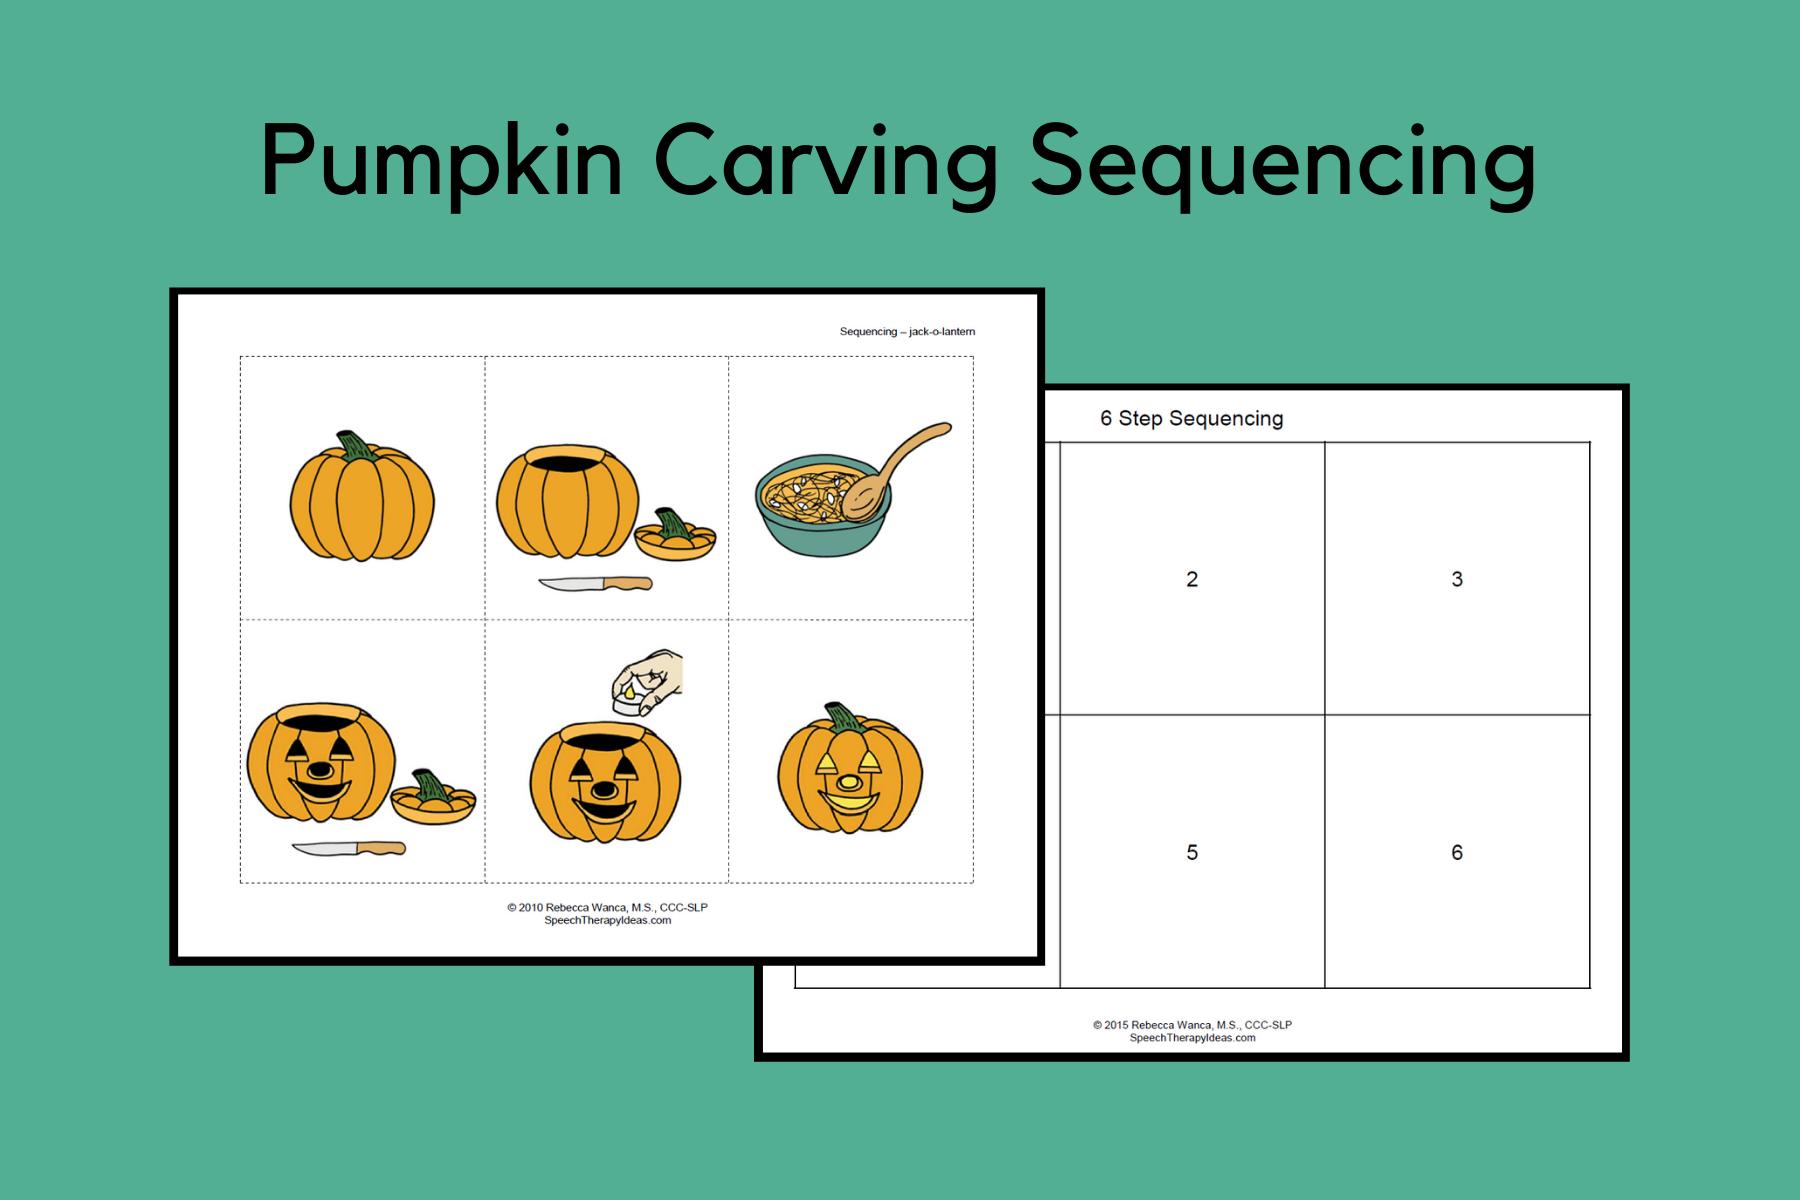 Pumpkin Carving Sequencing Activity